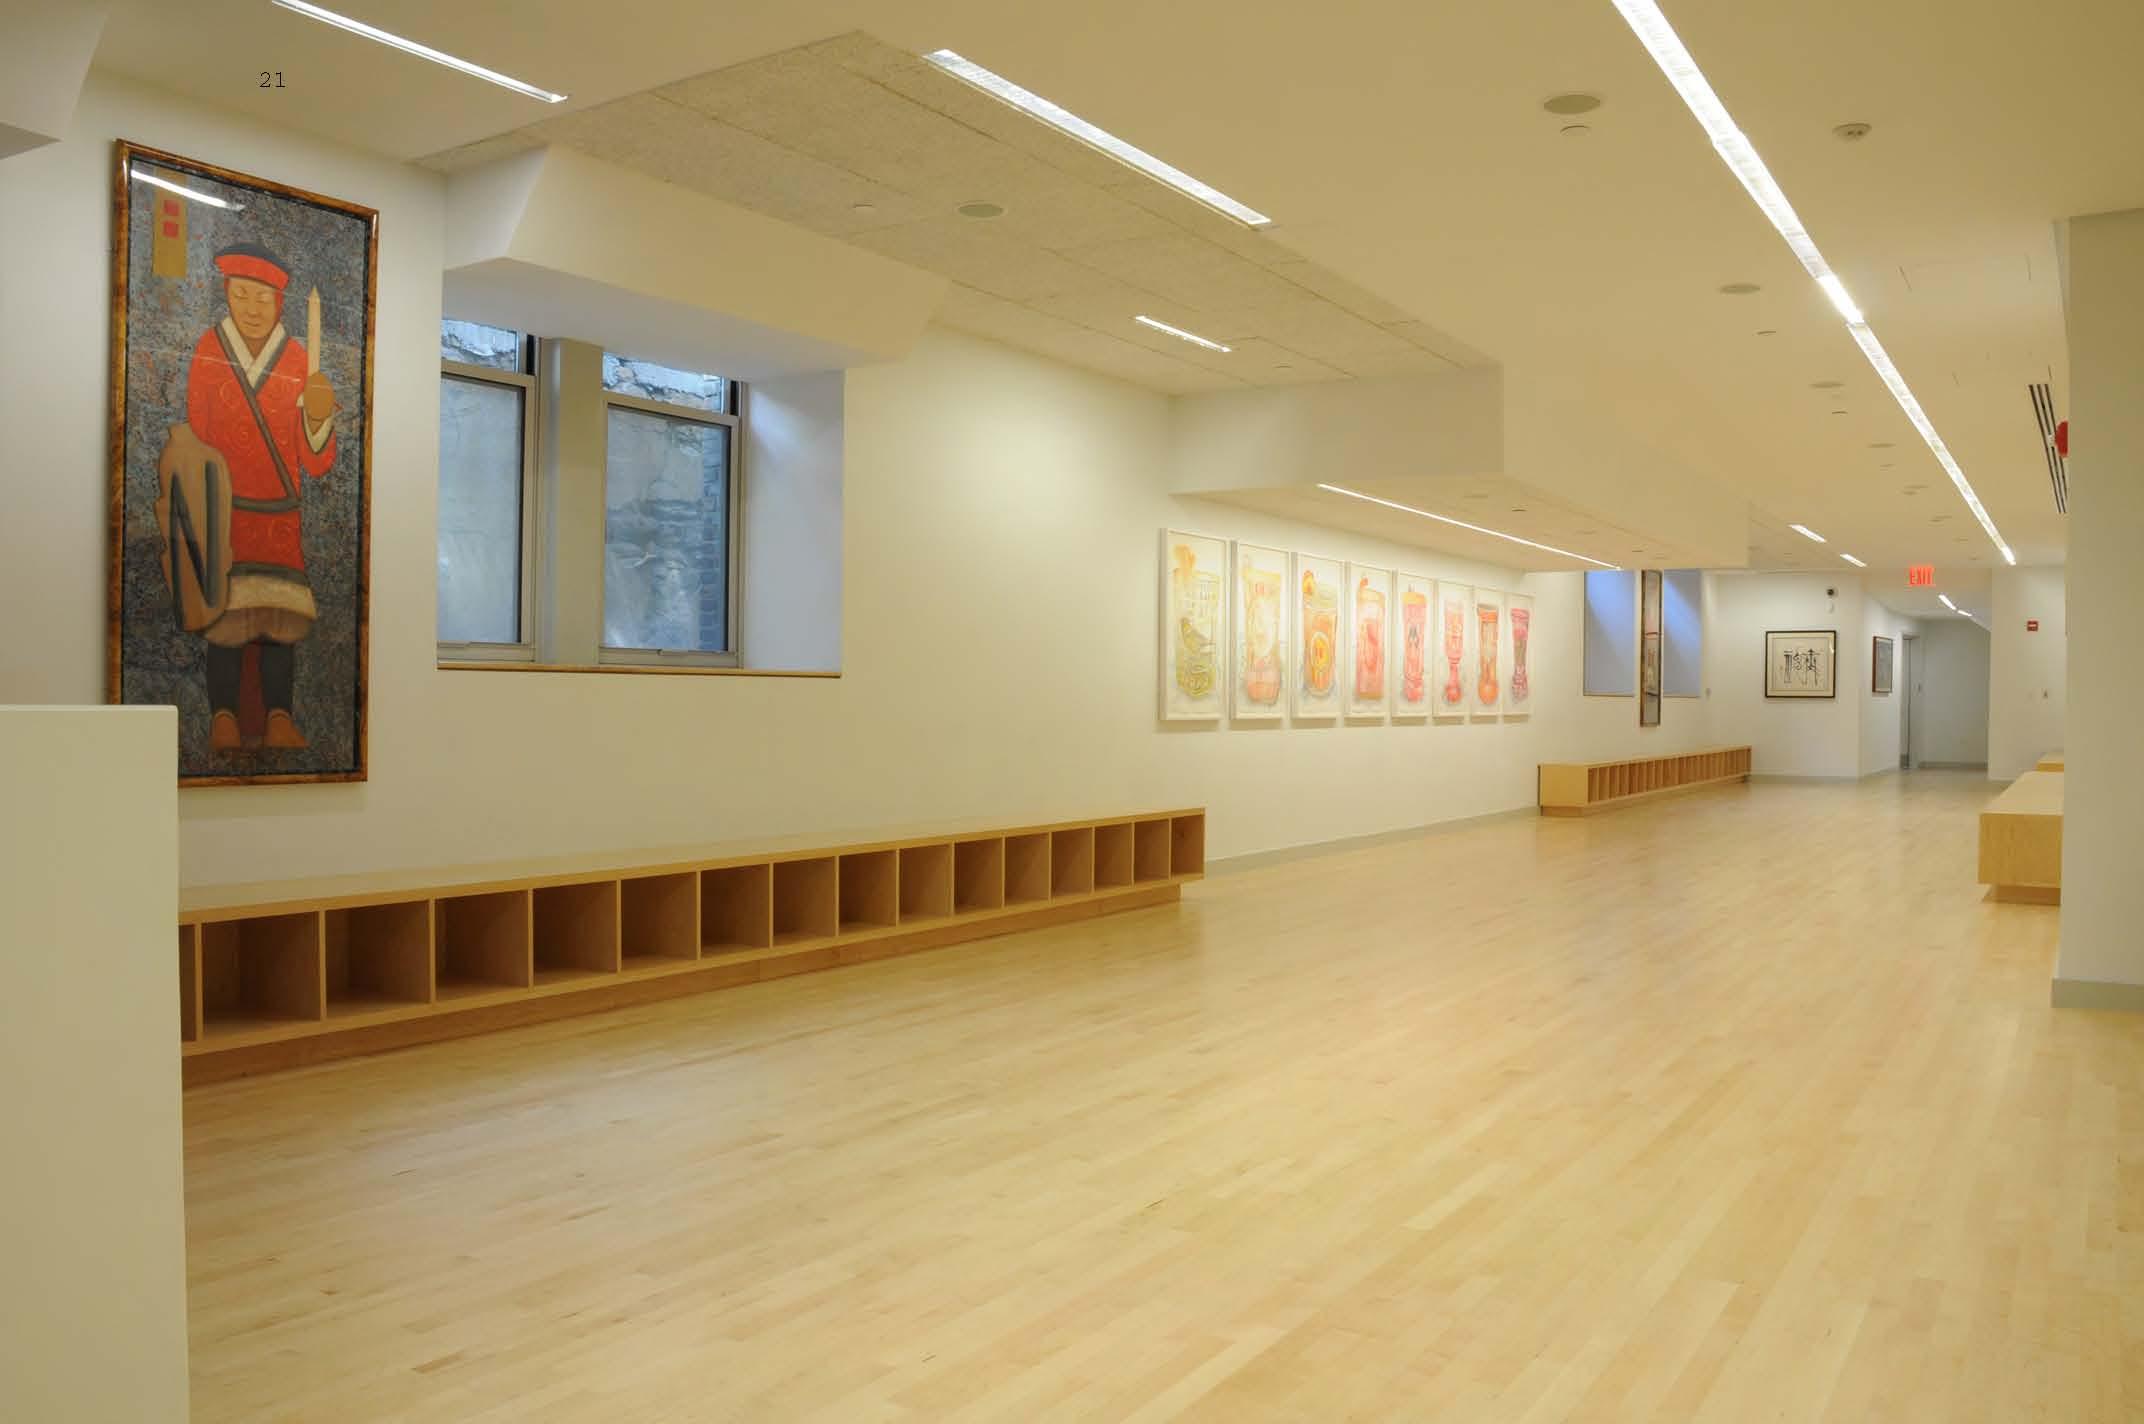 Image 21_National Dance Institute.jpg